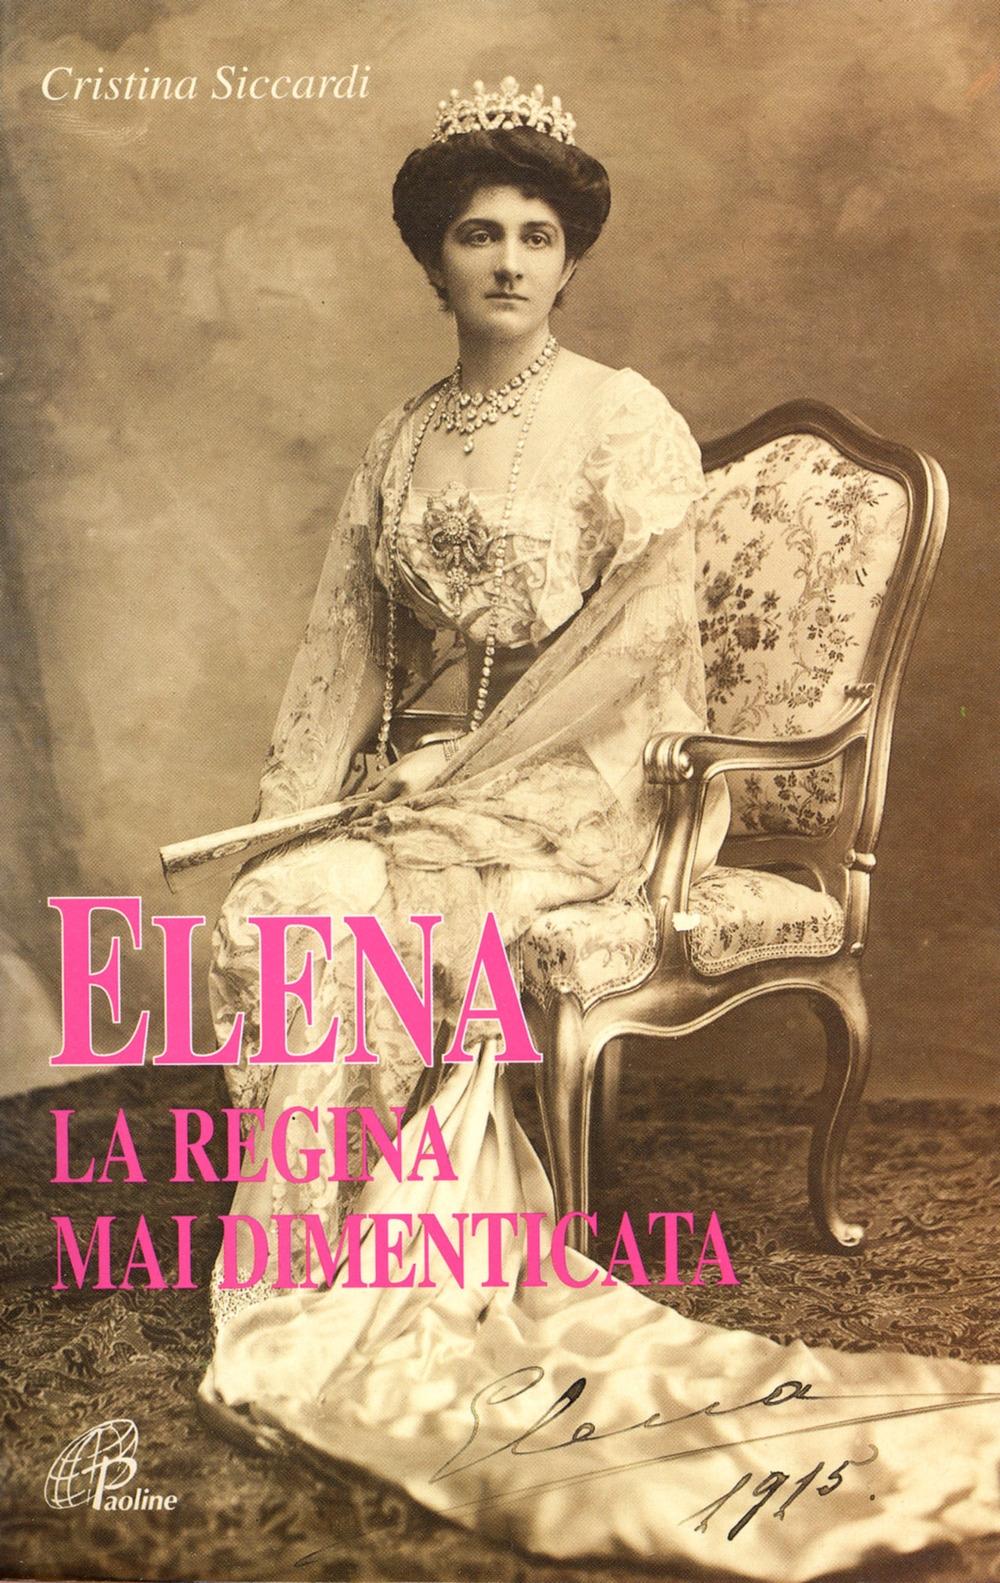 Elena la regina mai dimenticata.